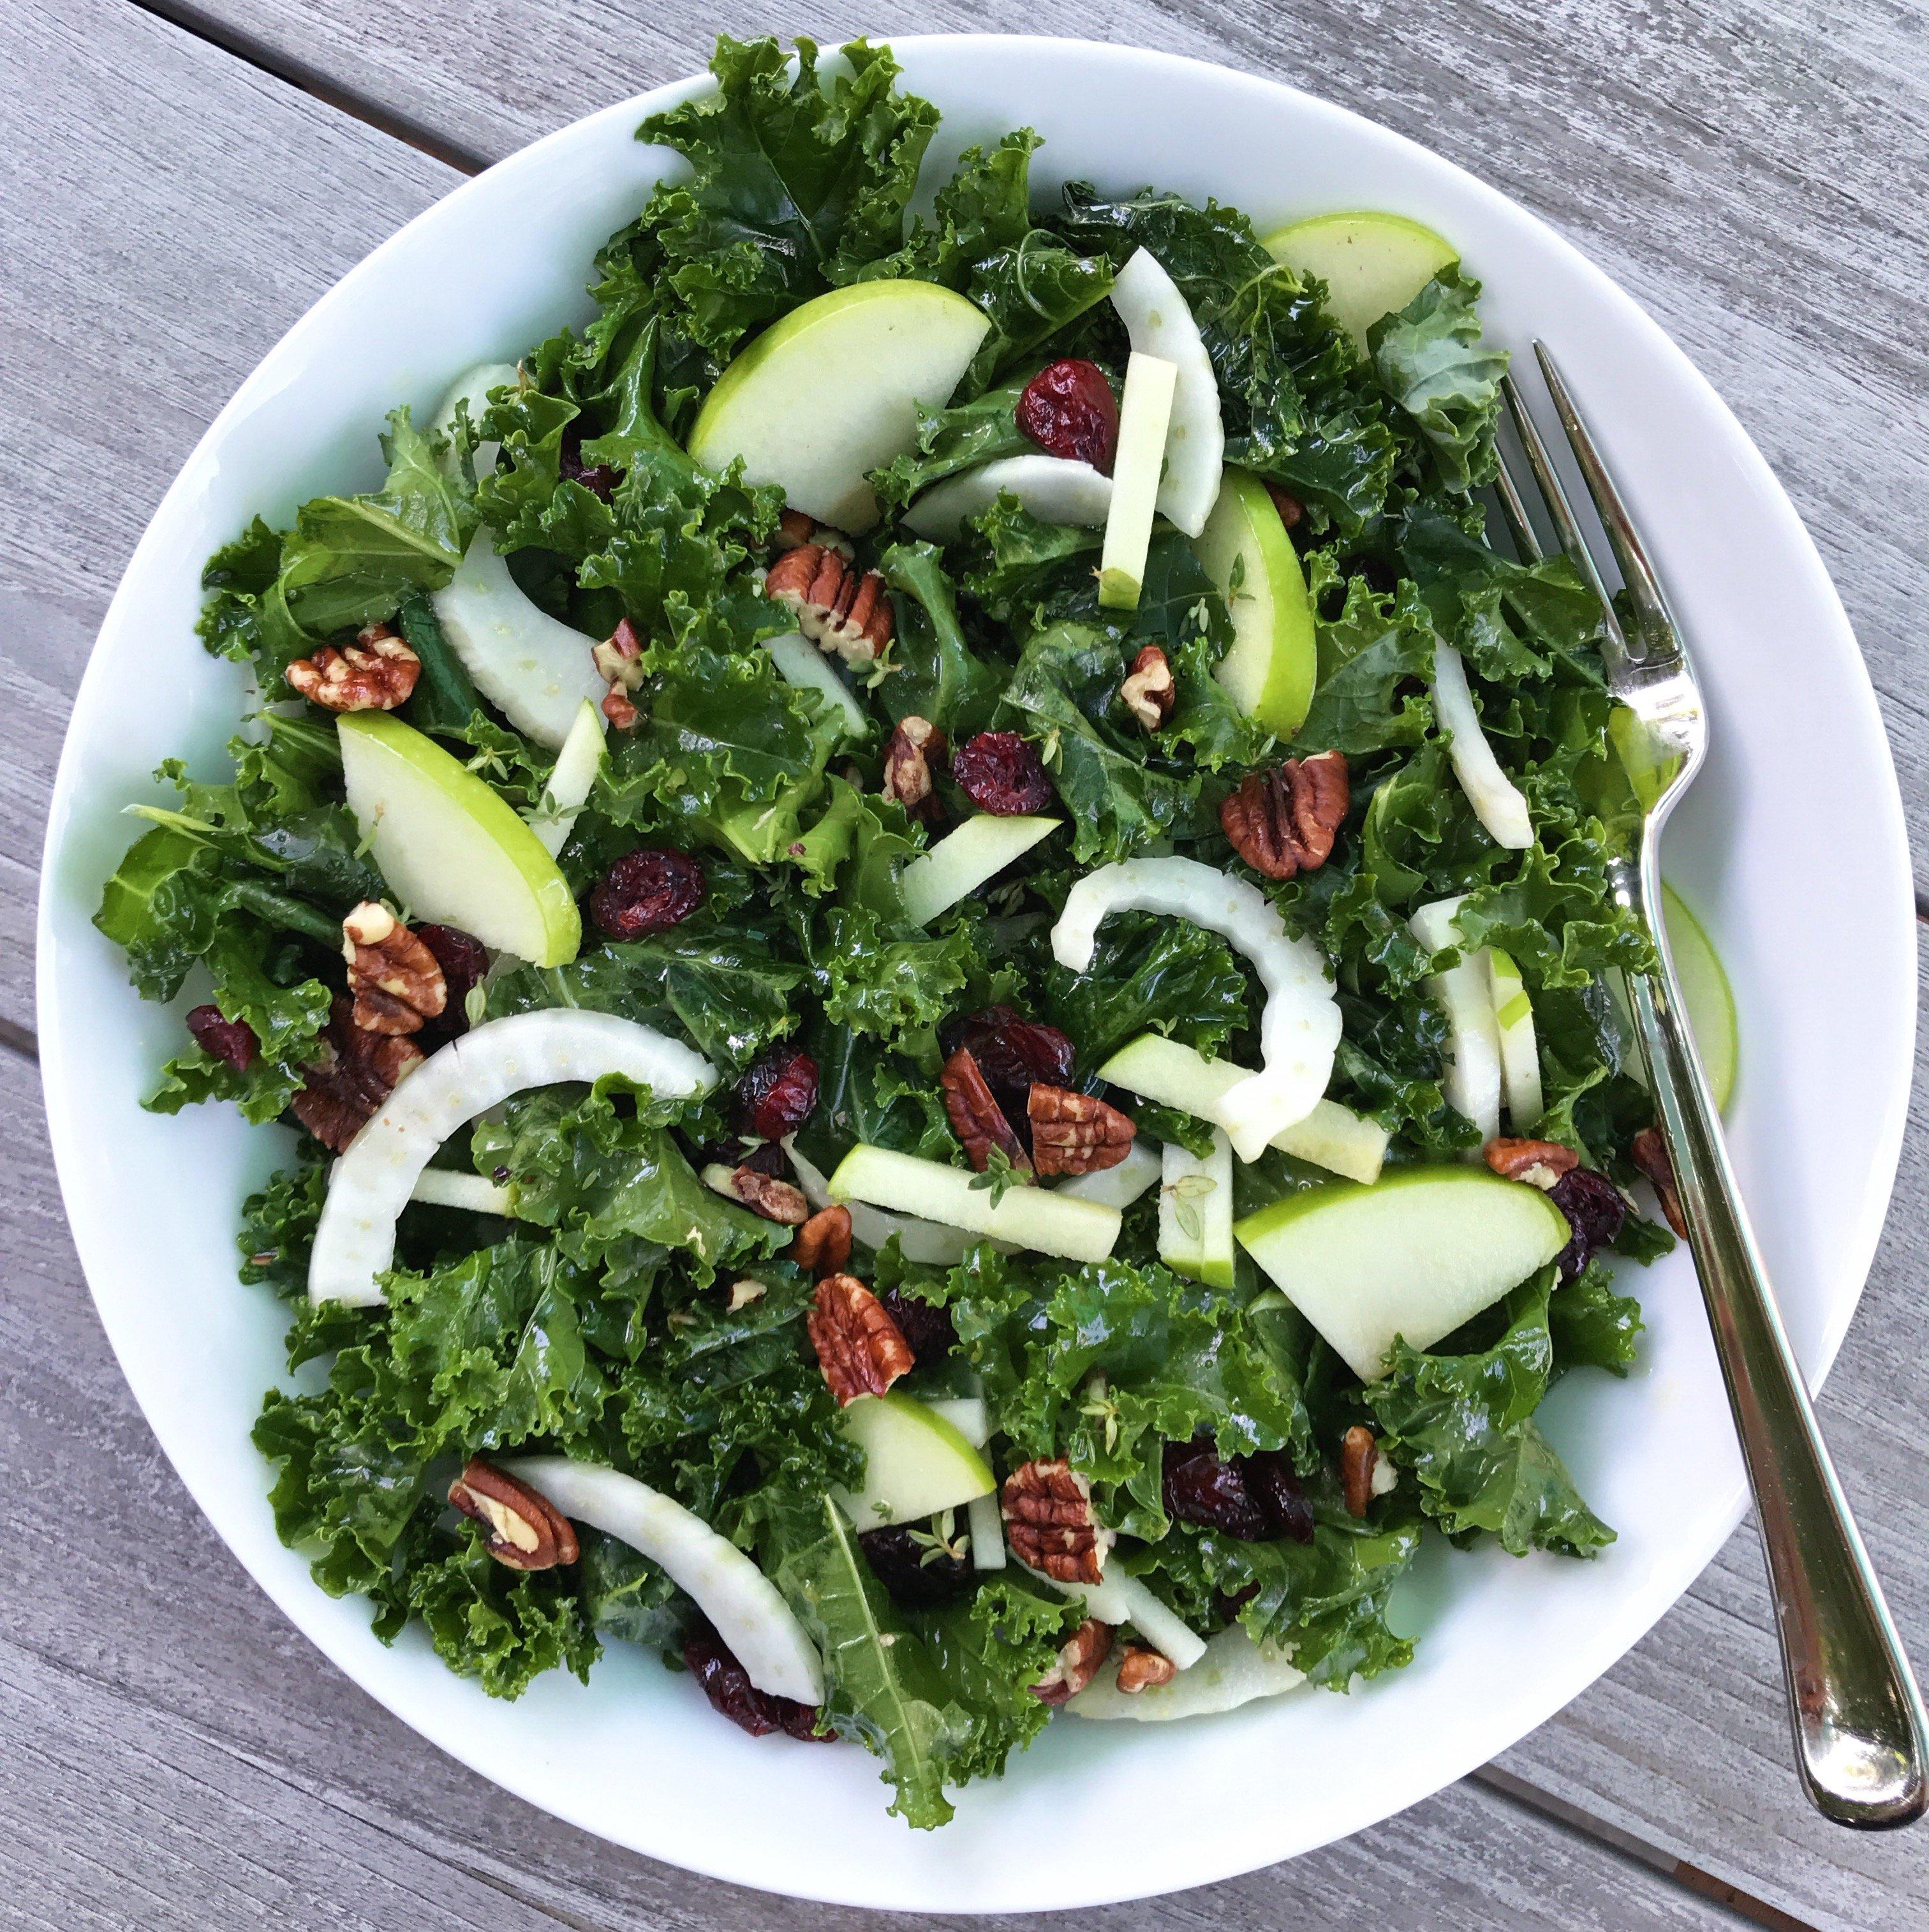 Fenway Farms Kale Salad gluten free #glutenfreerecipes www.healthygffamily.com